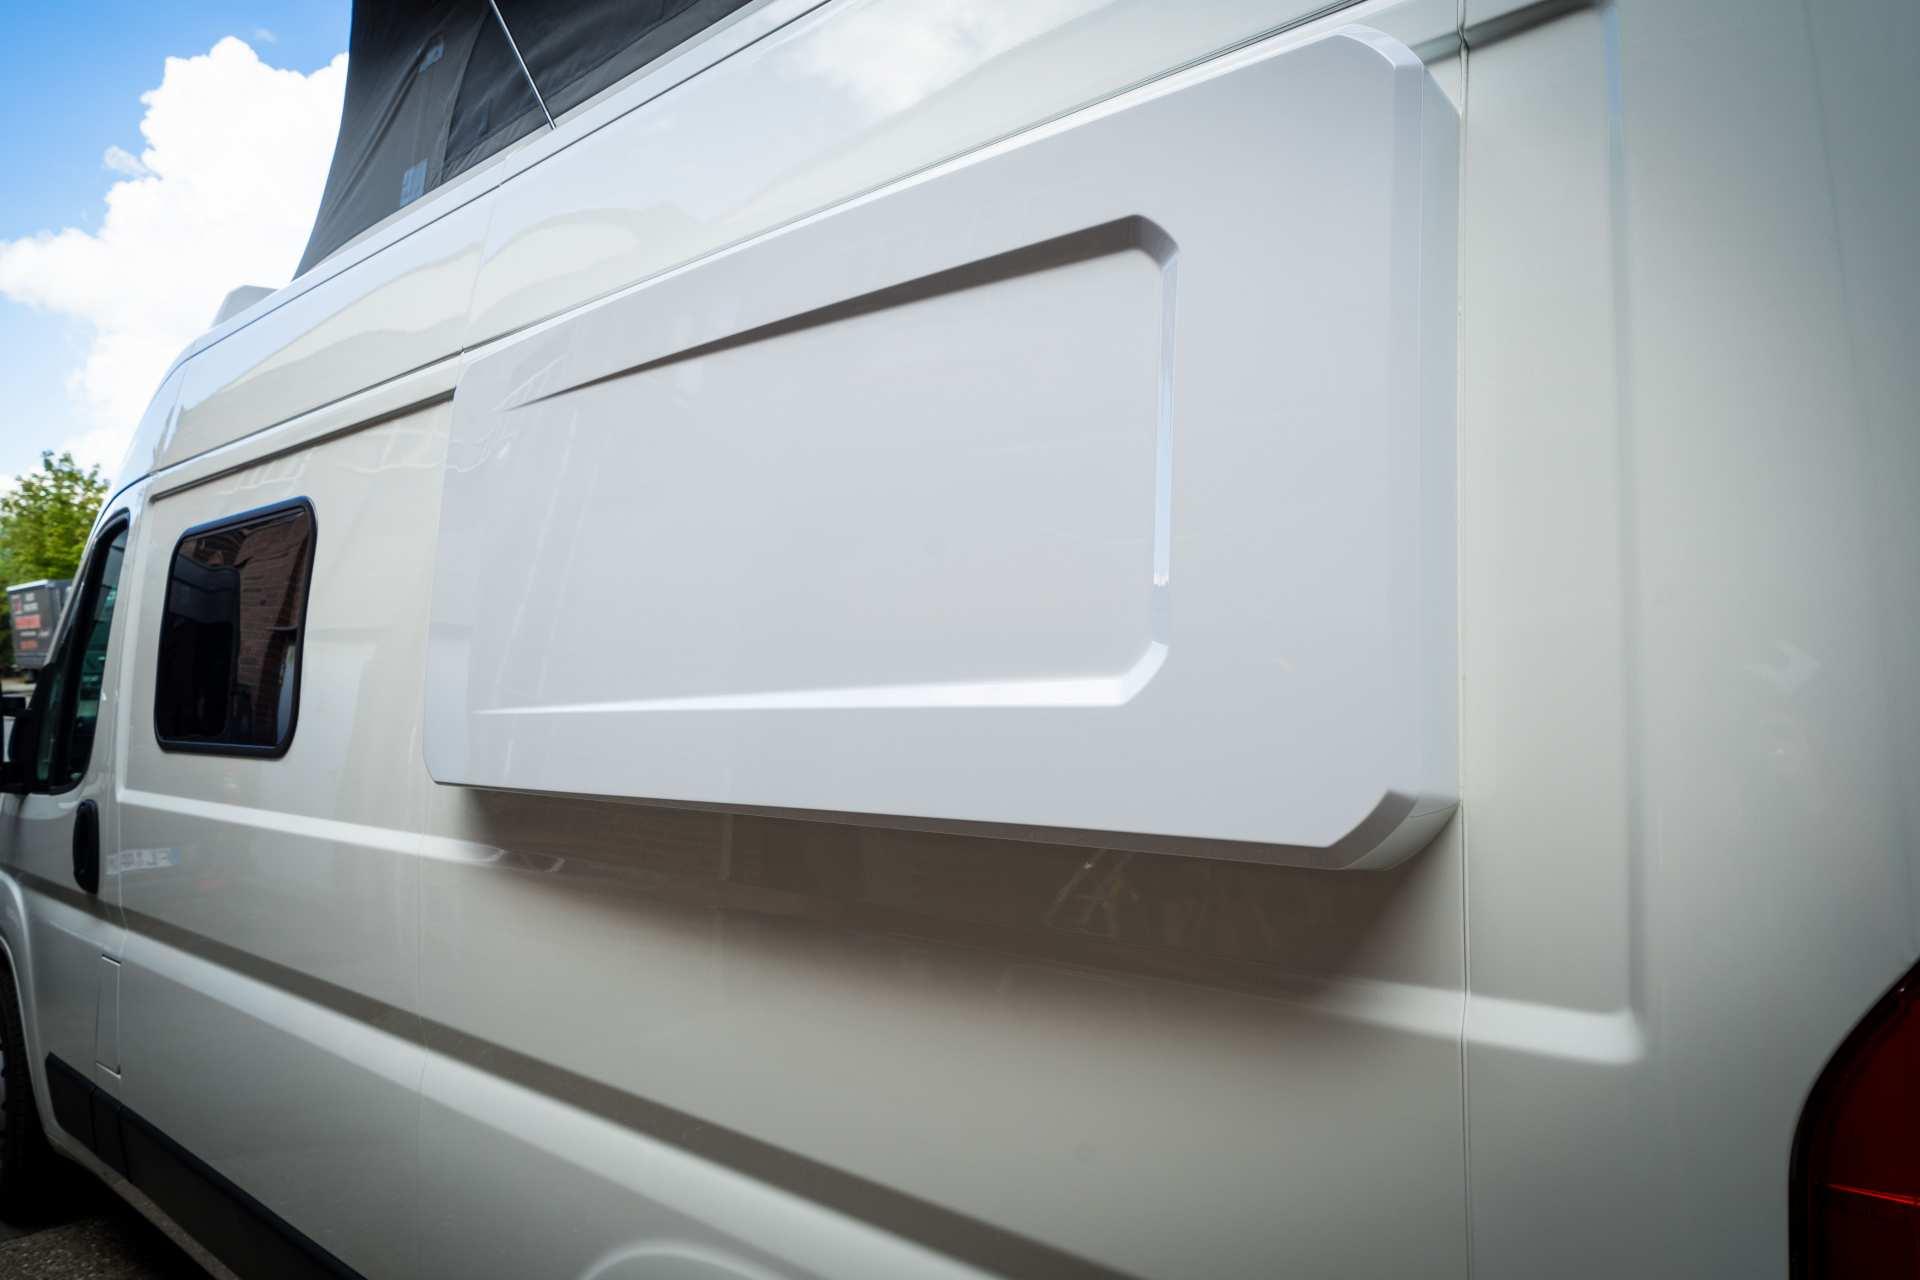 Individualausbau: Zwei-Raumwohnung Peugeot Boxer L2 H2 - 37